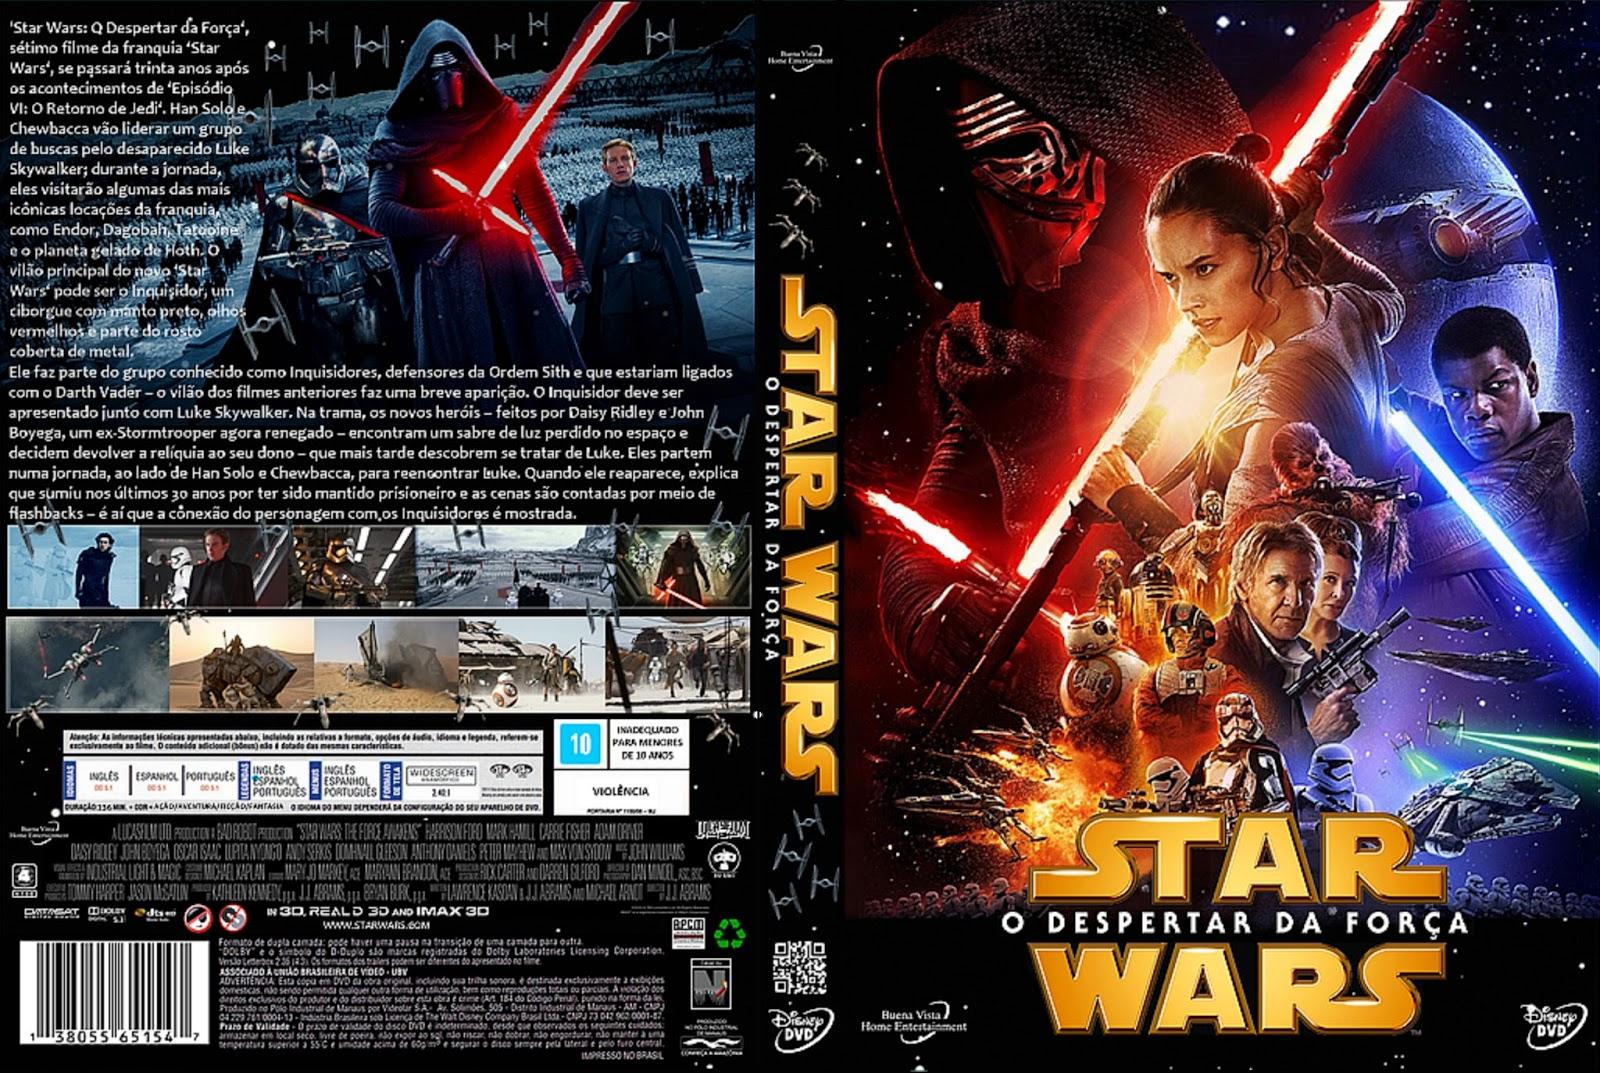 Star Wars O Despertar da Força BDRip XviD Dual Áudio Star 2BWars 2BEpis 25C3 25B3dio 2BVII 2B  2BO 2BDespertar 2Bda 2BFor 25C3 25A7a